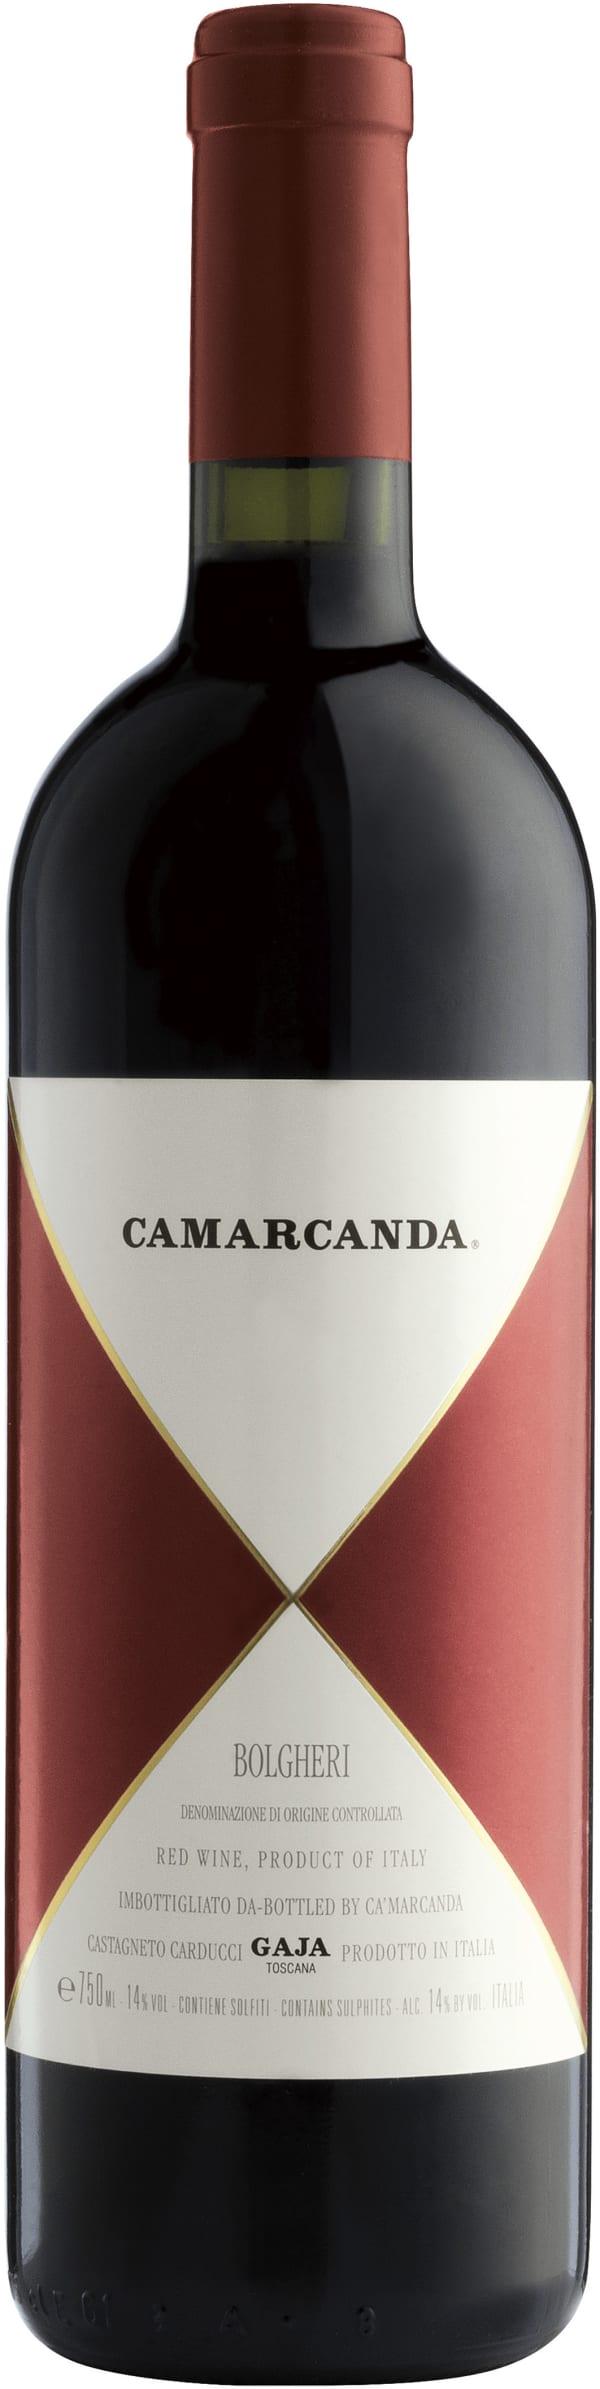 Gaja Camarcanda 2016